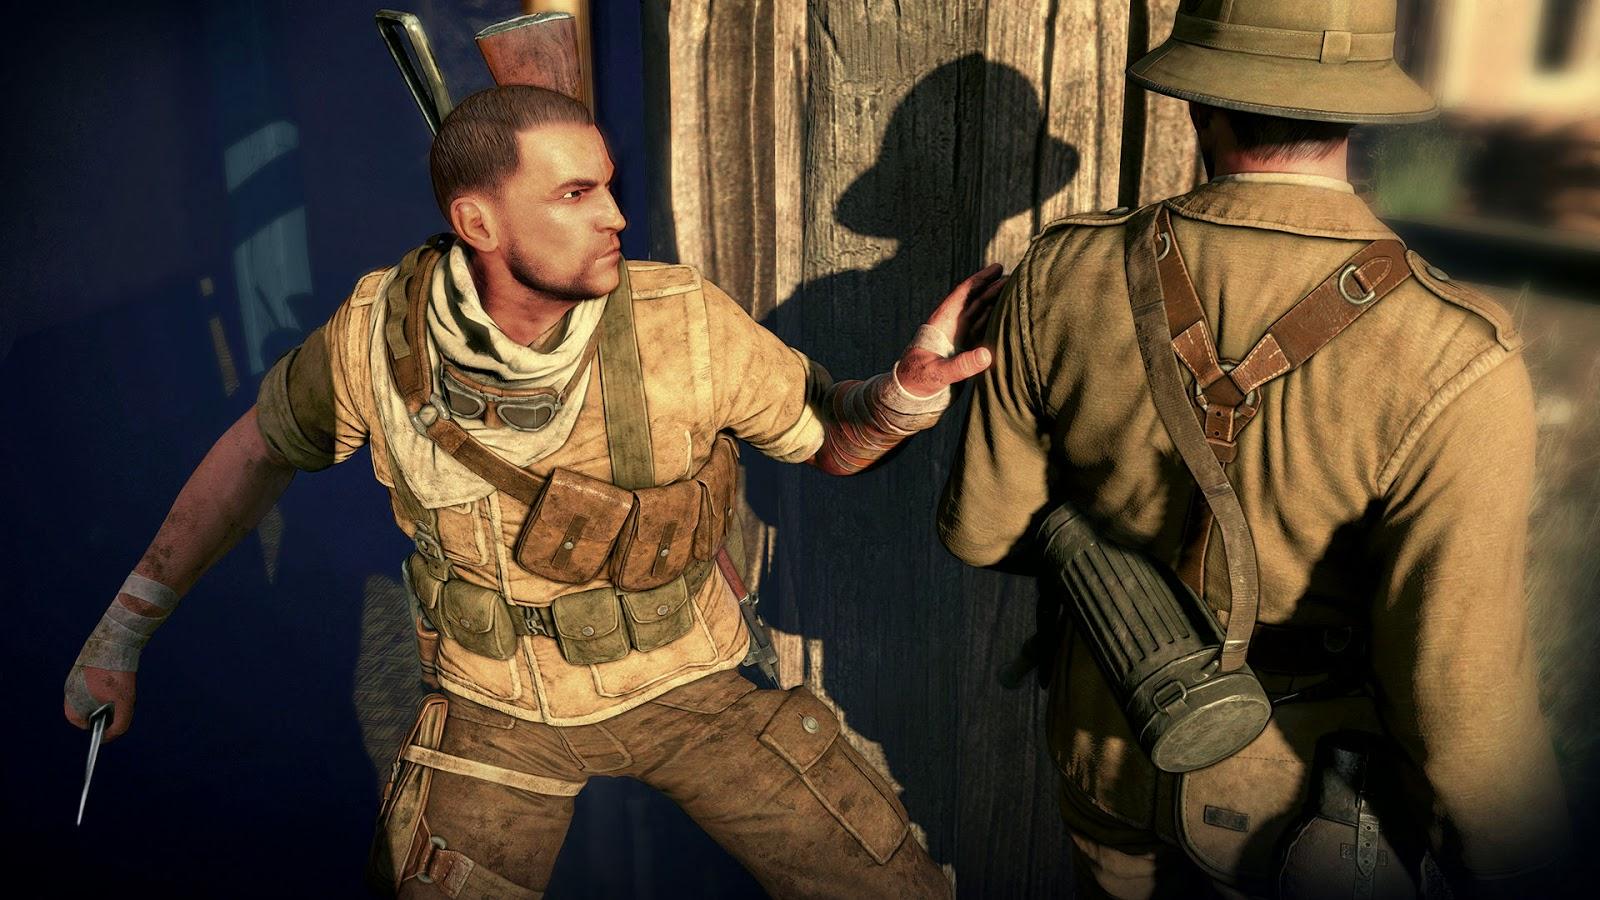 asesinato sigiloso videojuego shooter